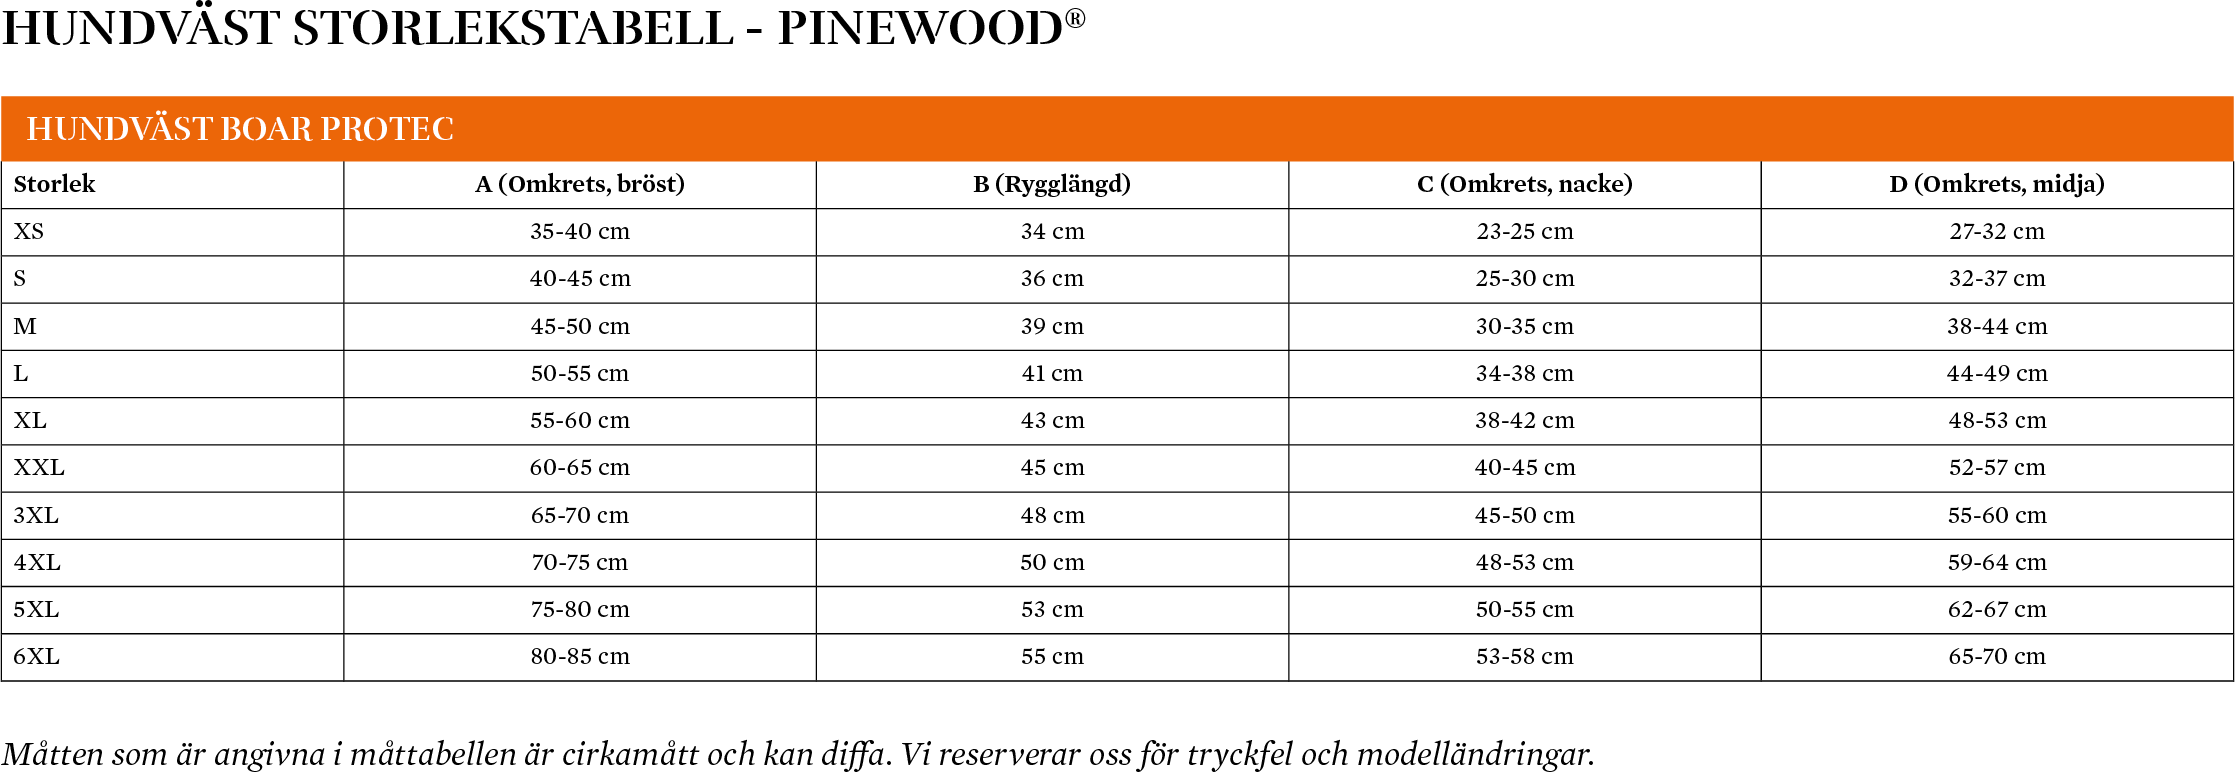 Size Chart 2018 - SE - Dog Vest 312dfb71daa00